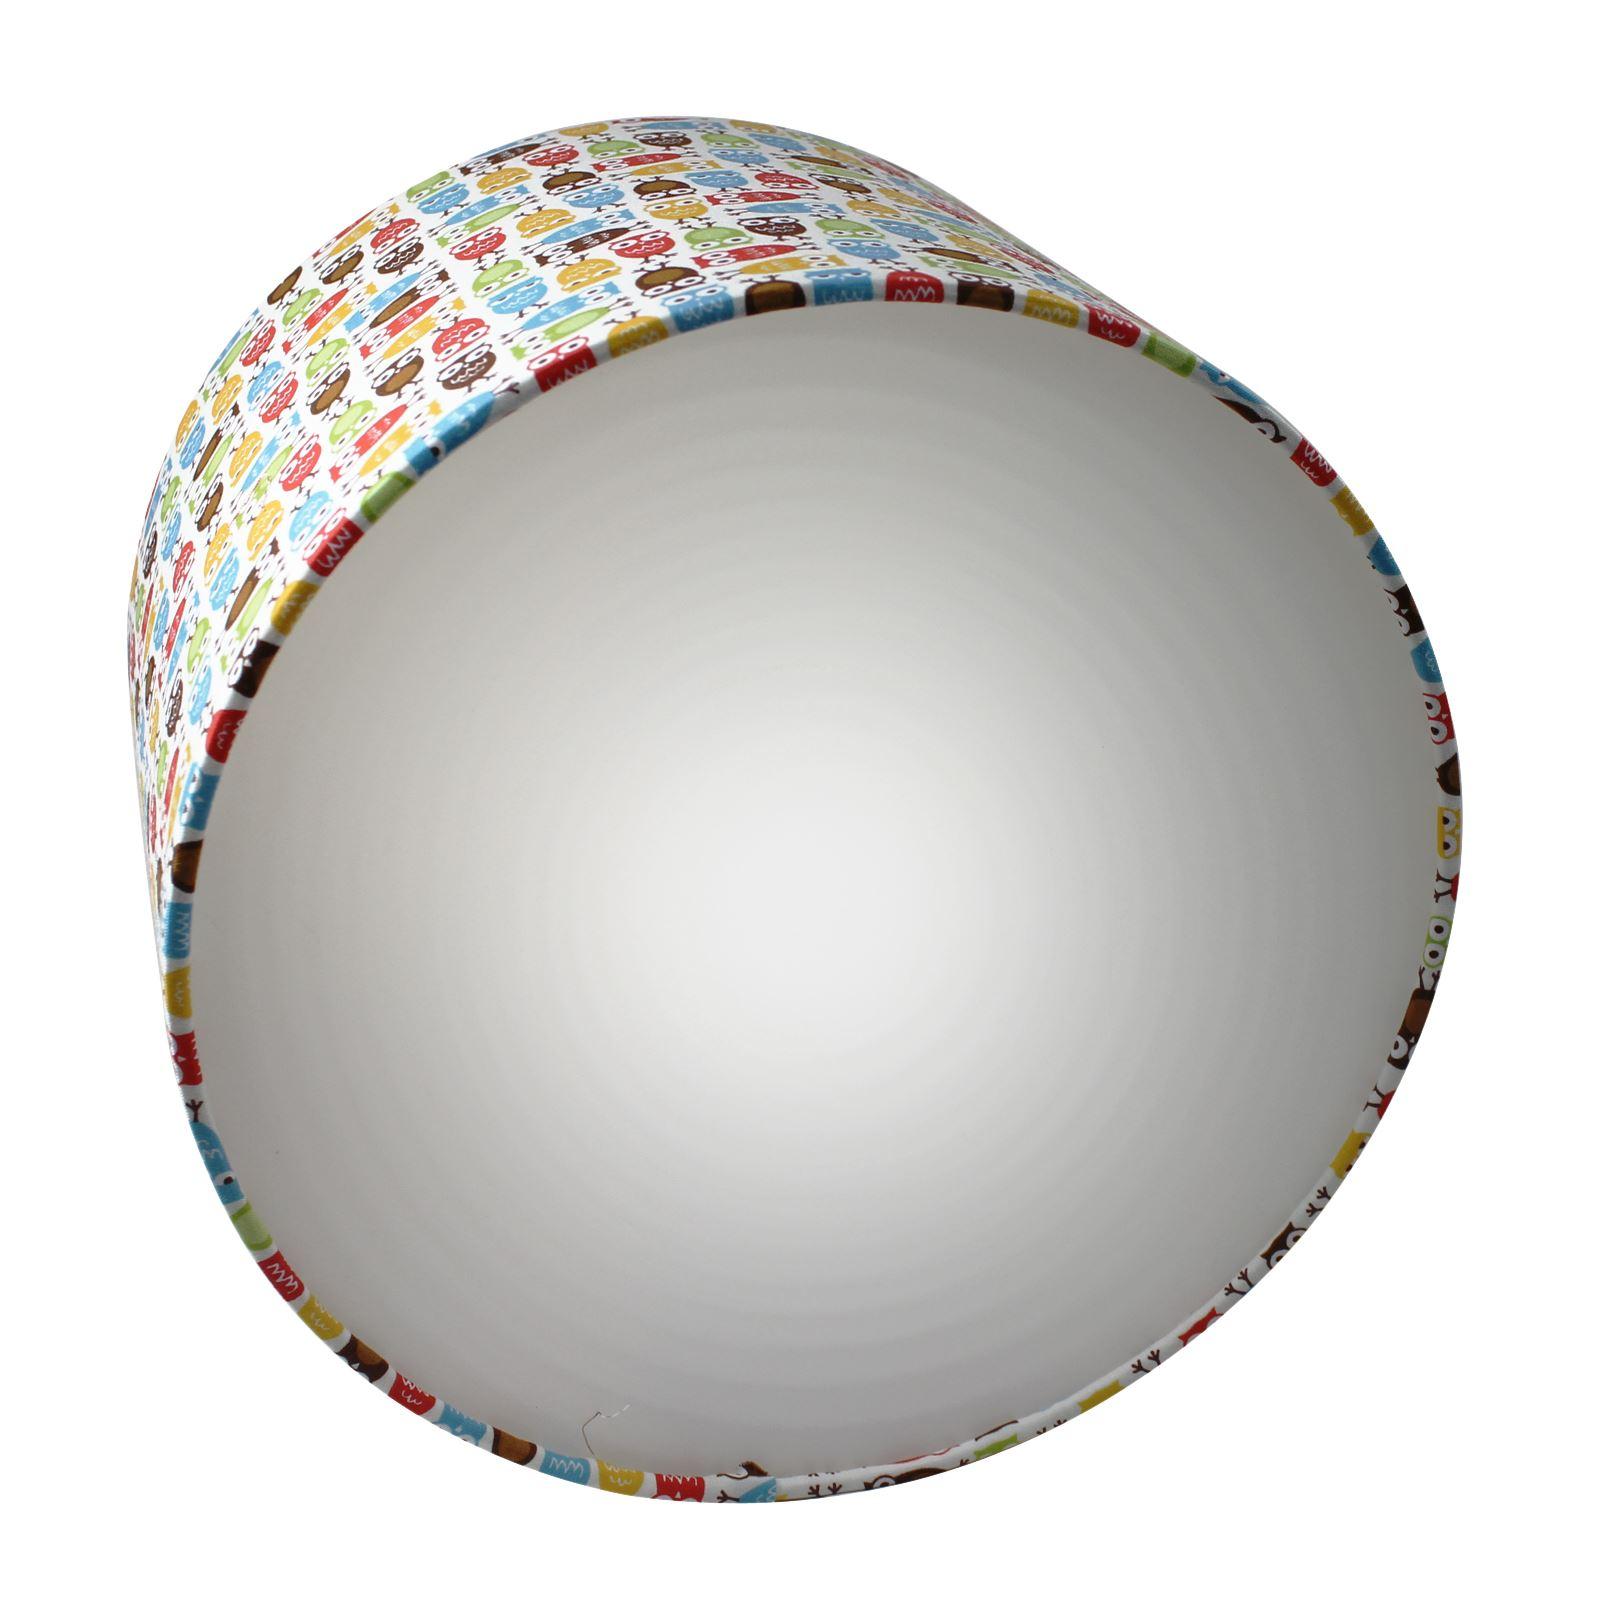 Haz-tu-propia-pantalla-diametro-30cm-KIT-de-Hagalo-usted-mismo-pantalla-haciendo-por-needcraft miniatura 8